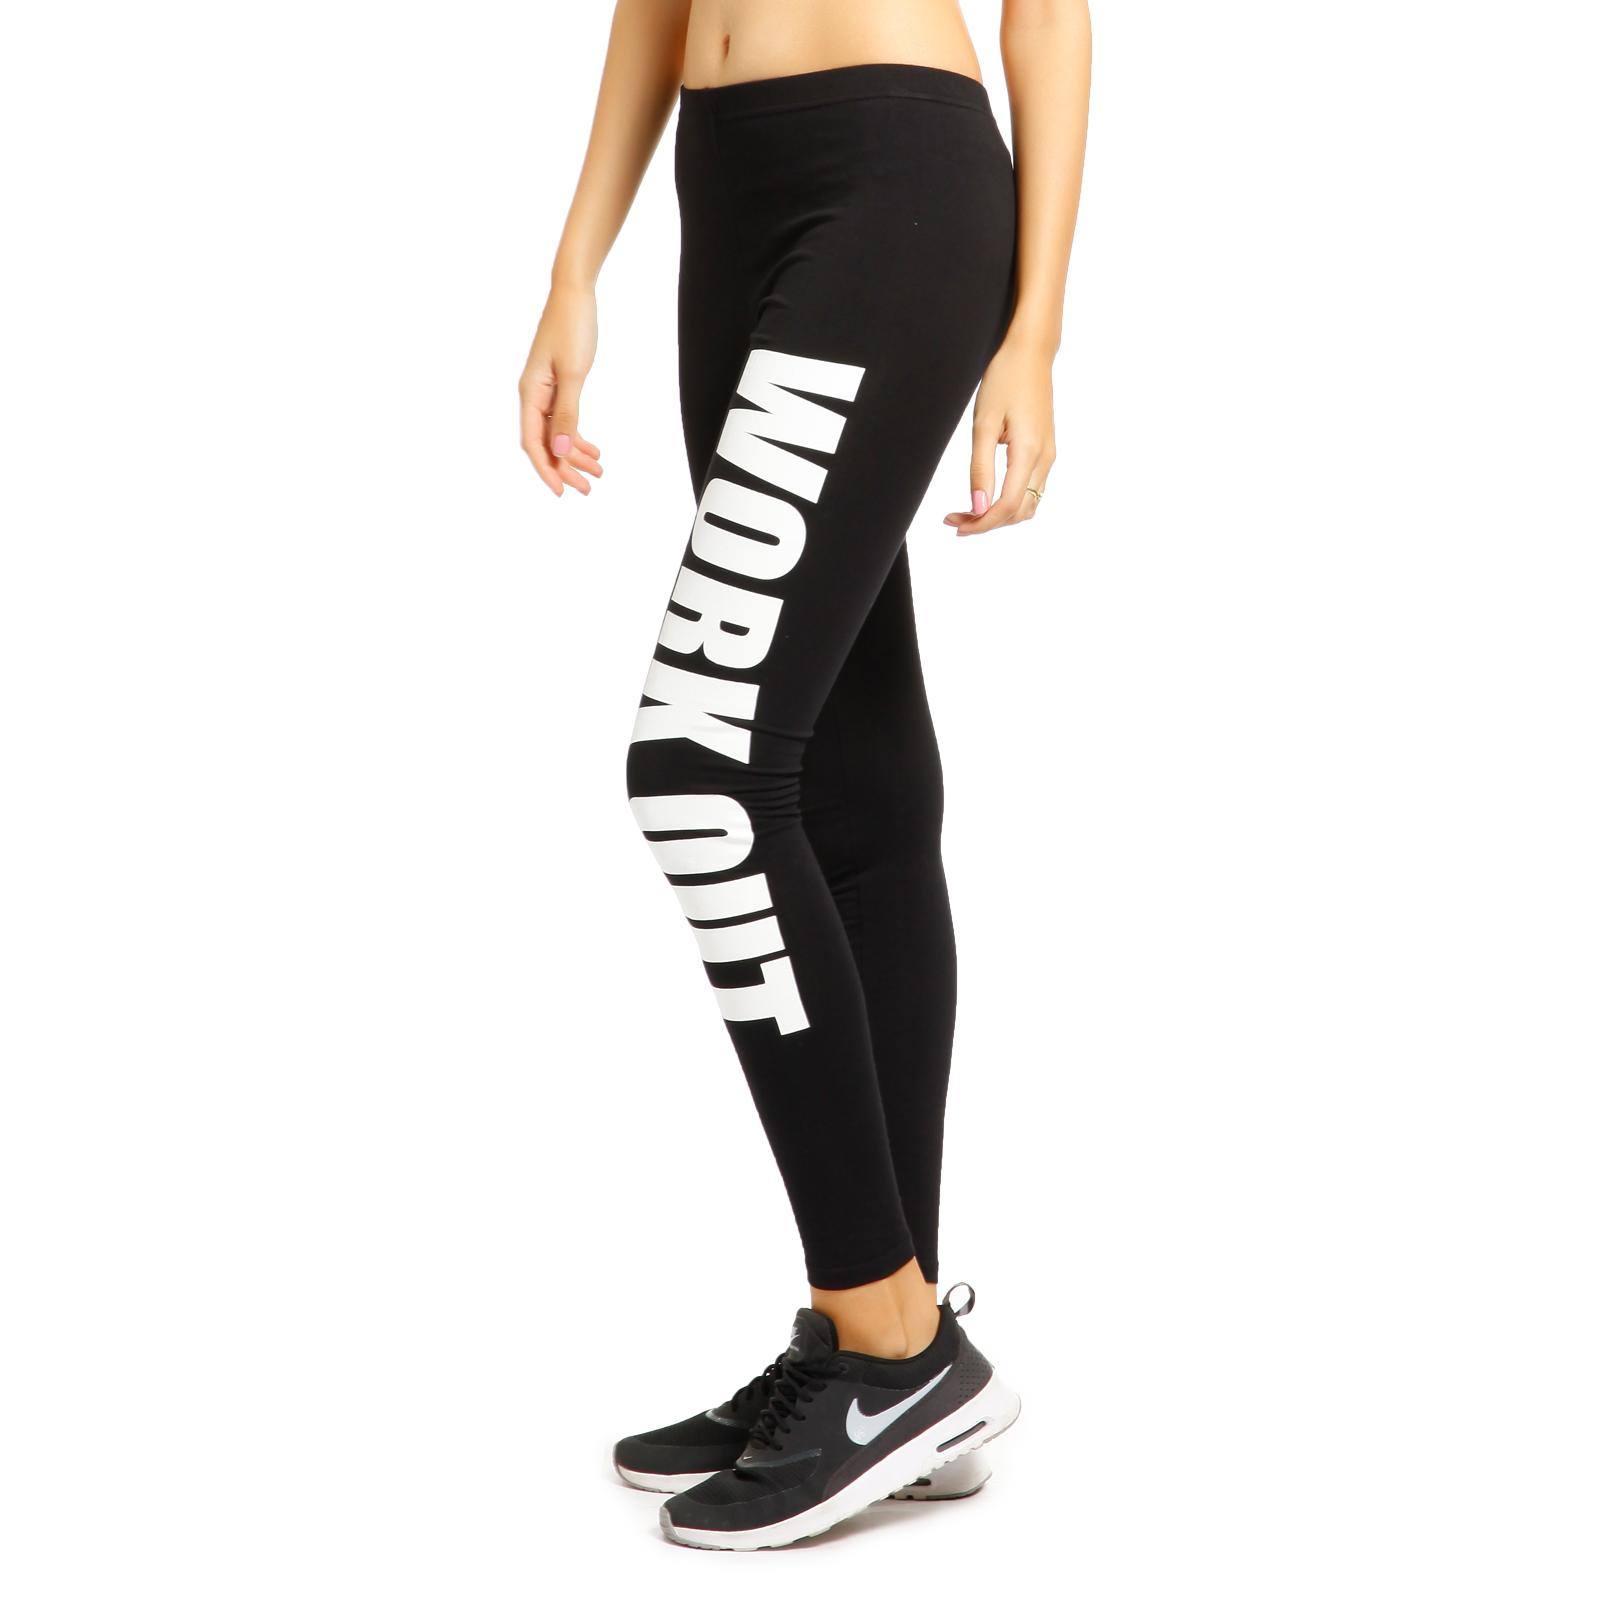 Sexy Push Up Padded VSX Sports Bra Skinny Yoga Pants